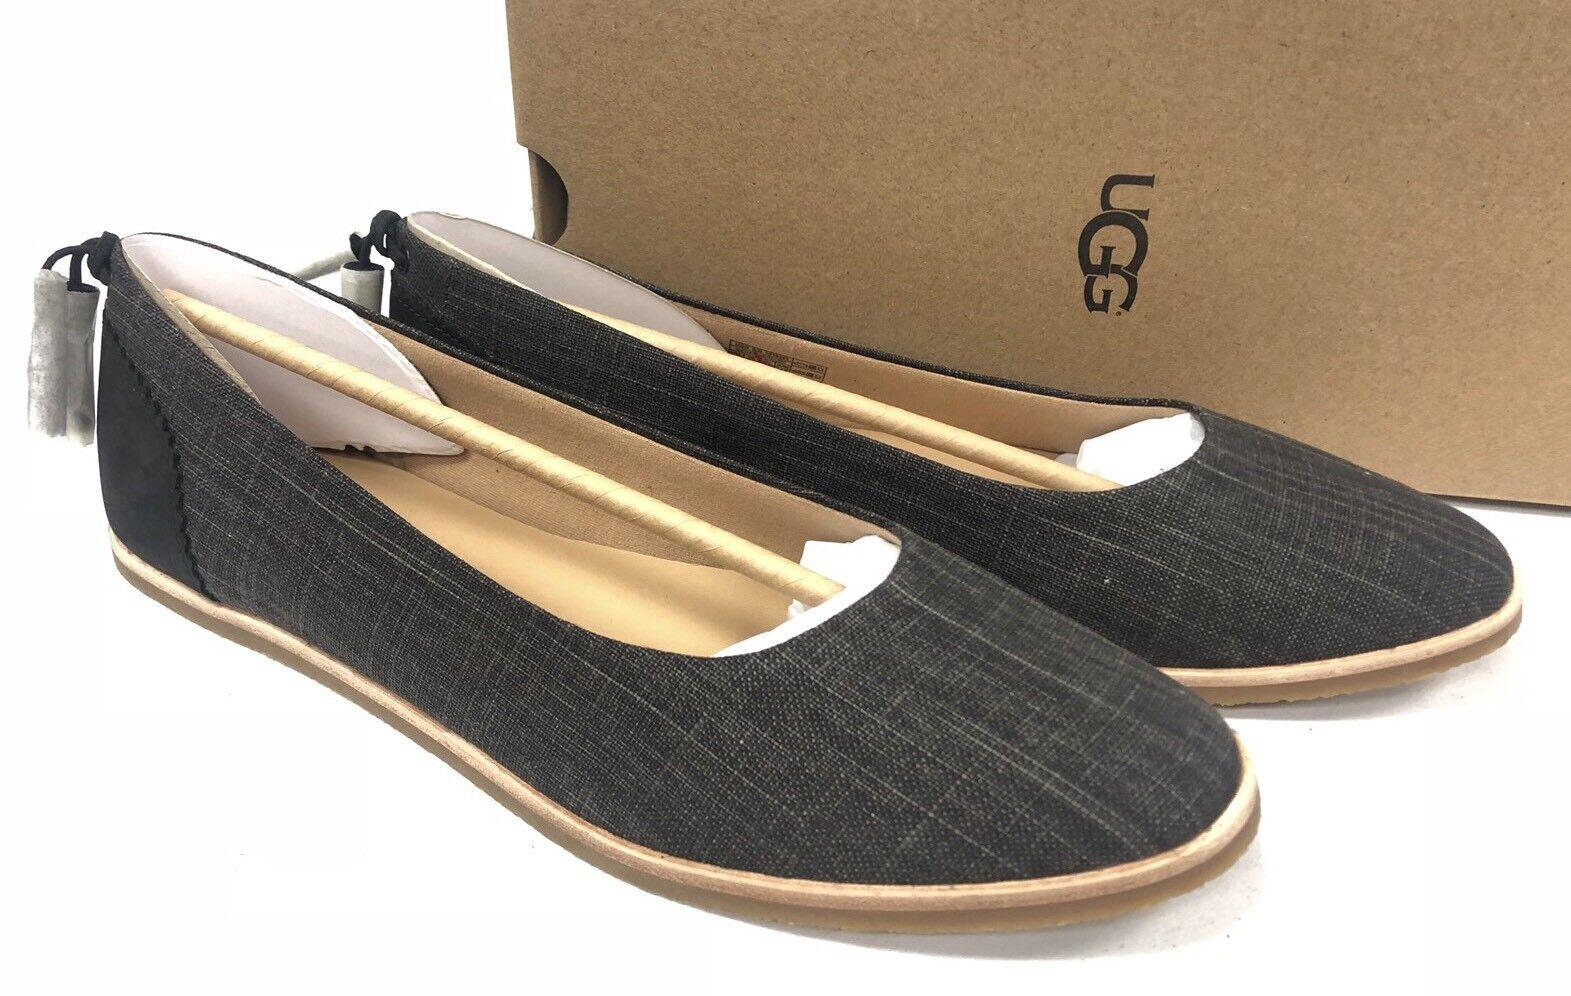 Ugg Australia Mesa Tassel Flats 1018631 Black Slip On Canvas Nubuck Women's Shoe